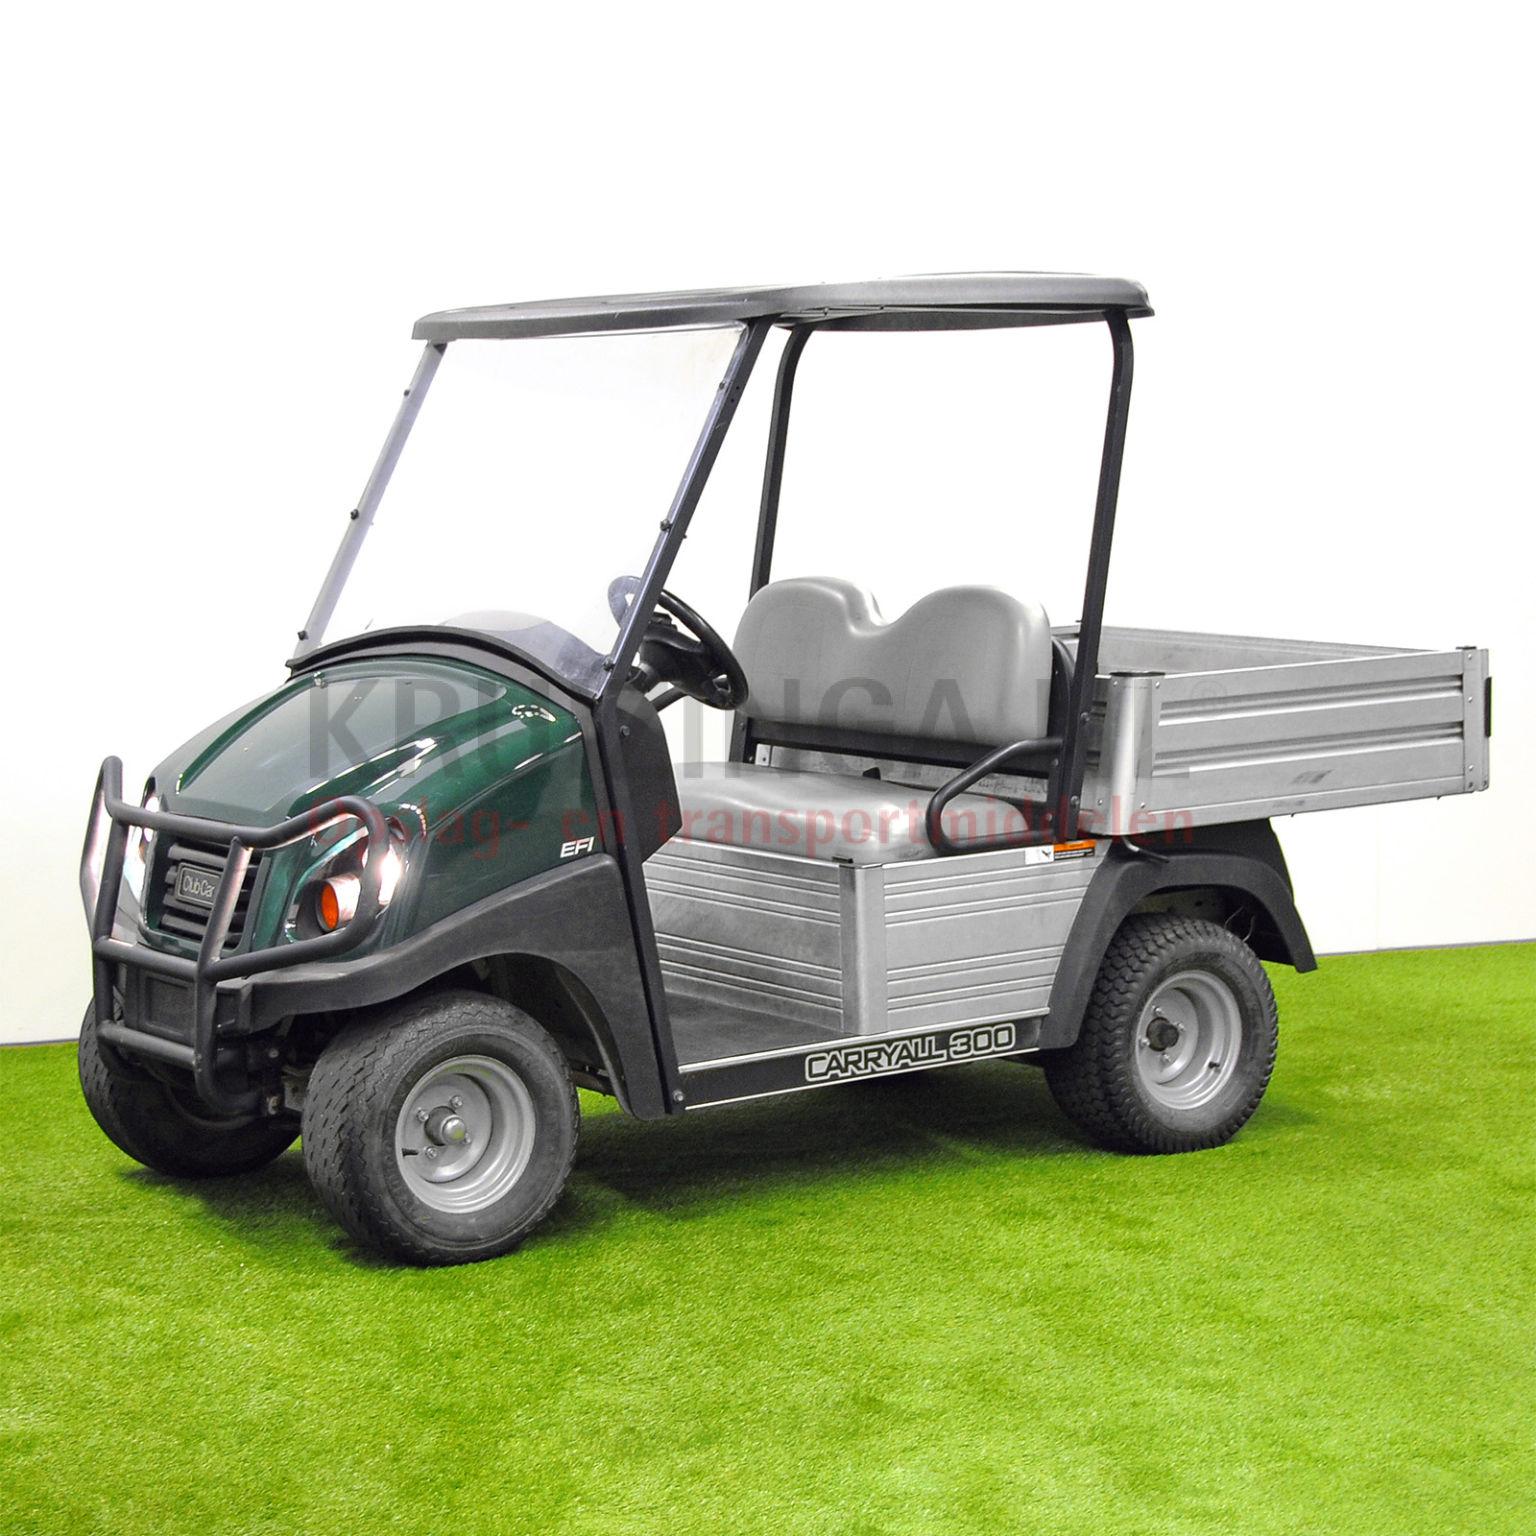 golfwagen club car carryall 300 mit ladefl che benzin. Black Bedroom Furniture Sets. Home Design Ideas